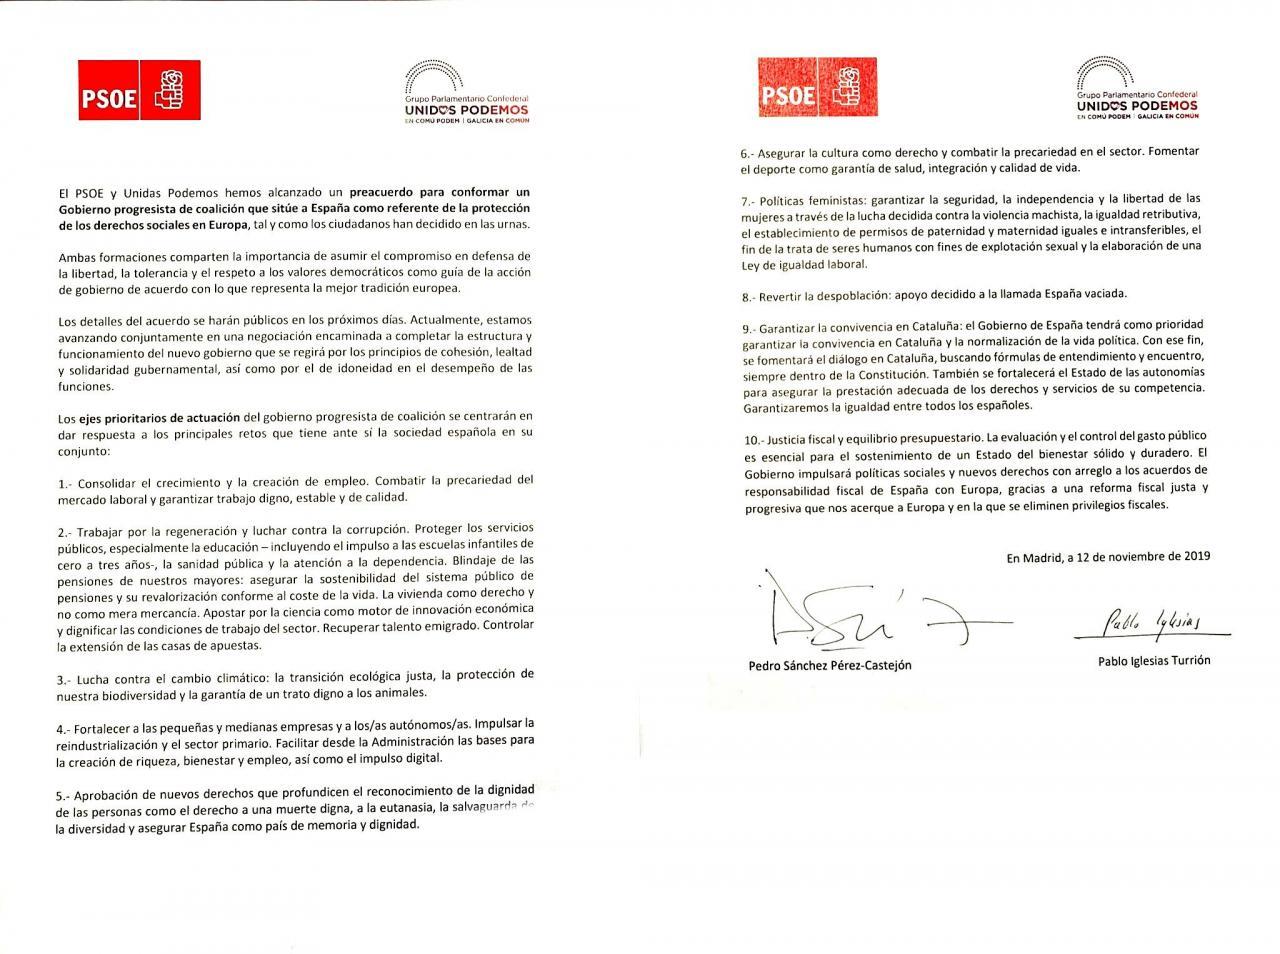 Sánchez firma un acuerdo con Podemos para formar Gobierno en España